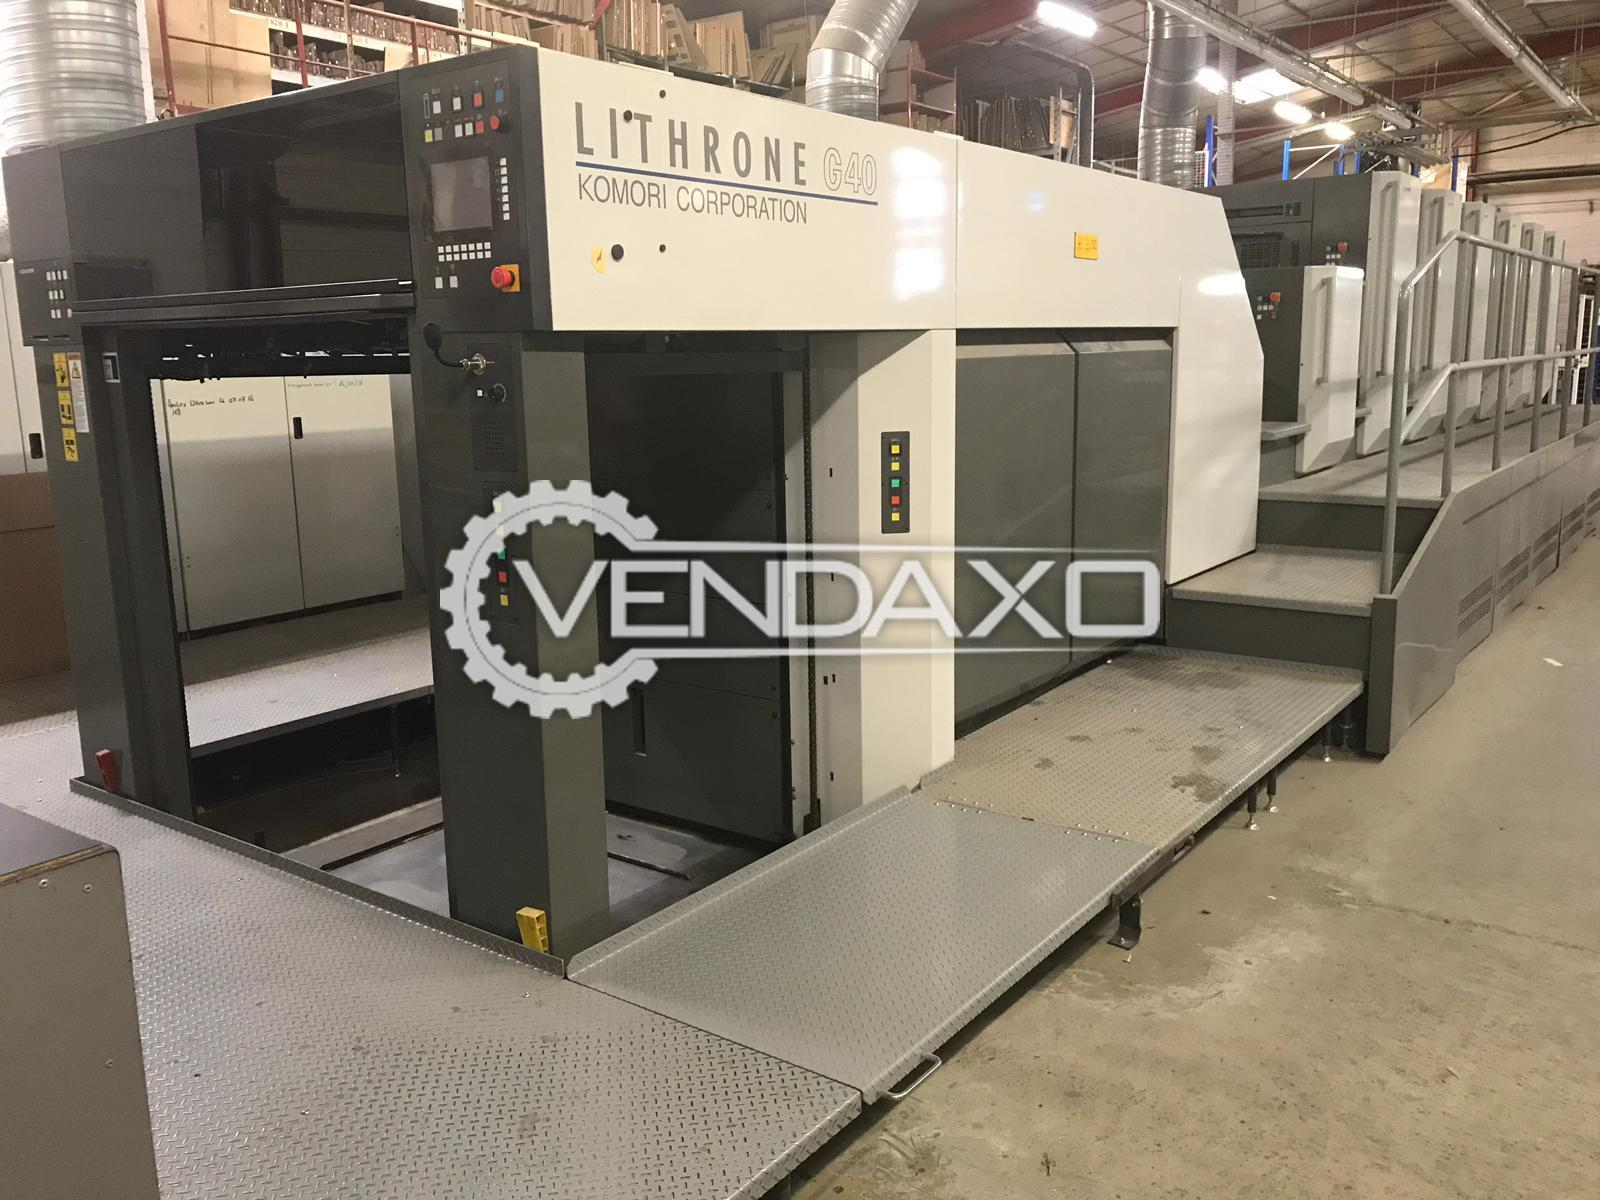 Komori Lithrone G640 Offset Printing Machine - 28 x 40 Inch, 6 Color